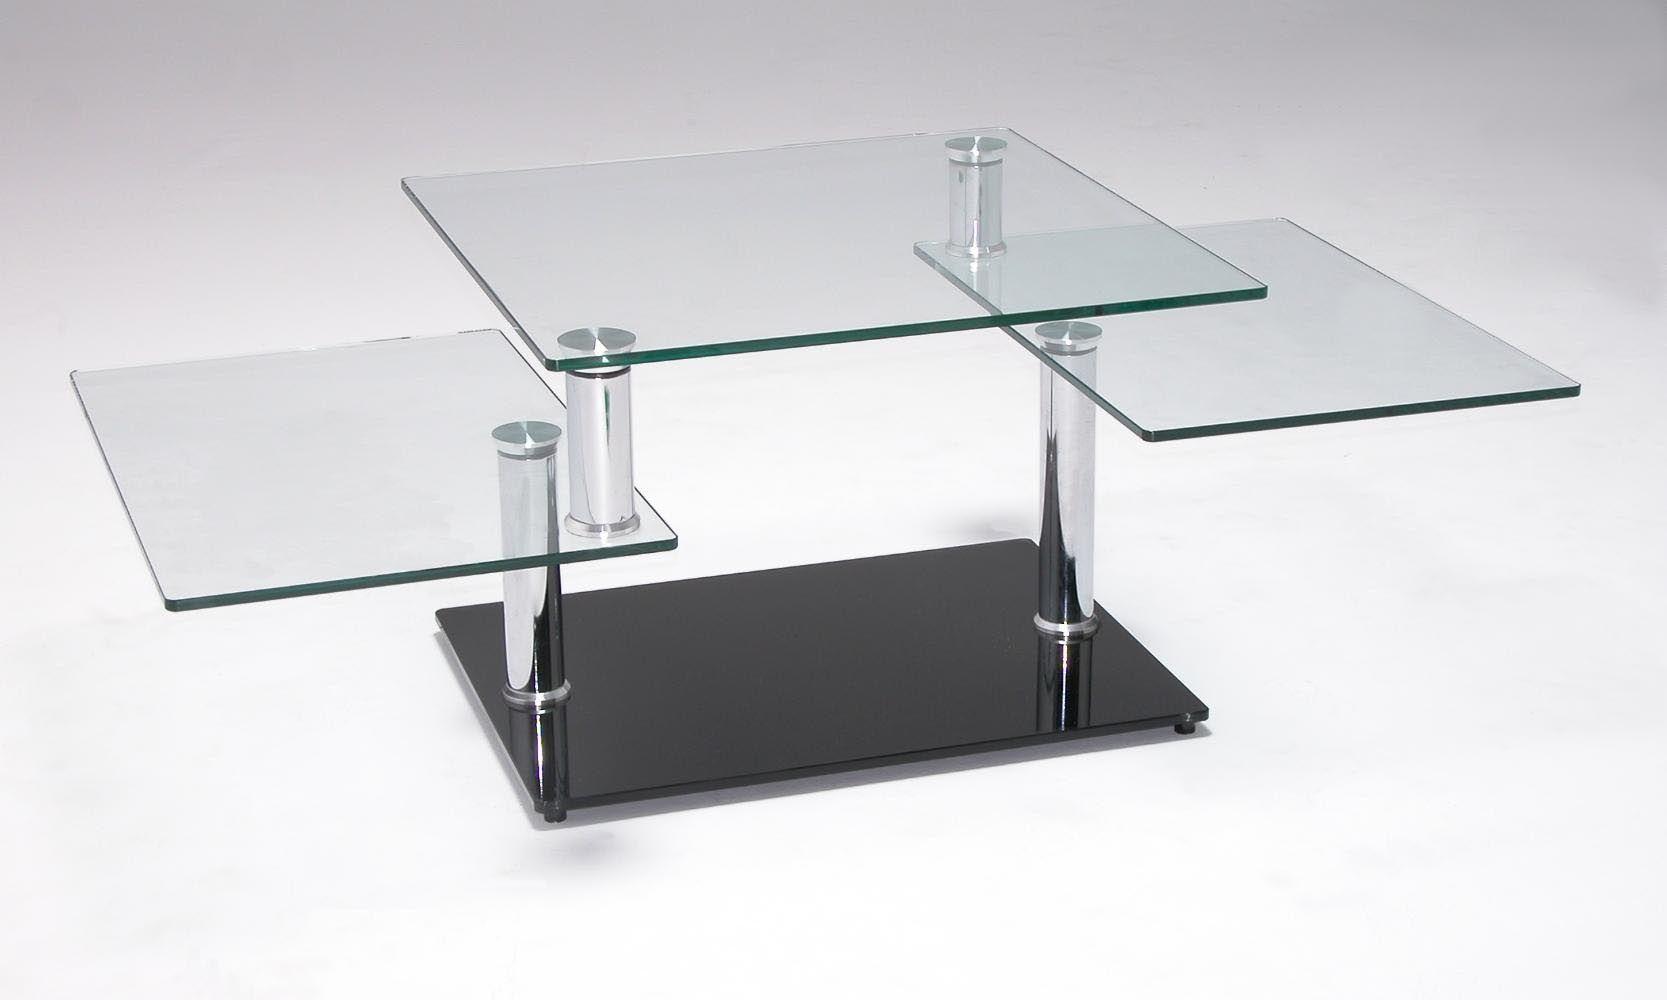 Folding Glass Coffee Table Coffee Table Design Ideas Modern Coffee Tables Coffee Table Coffee Table Design [ 1000 x 1667 Pixel ]